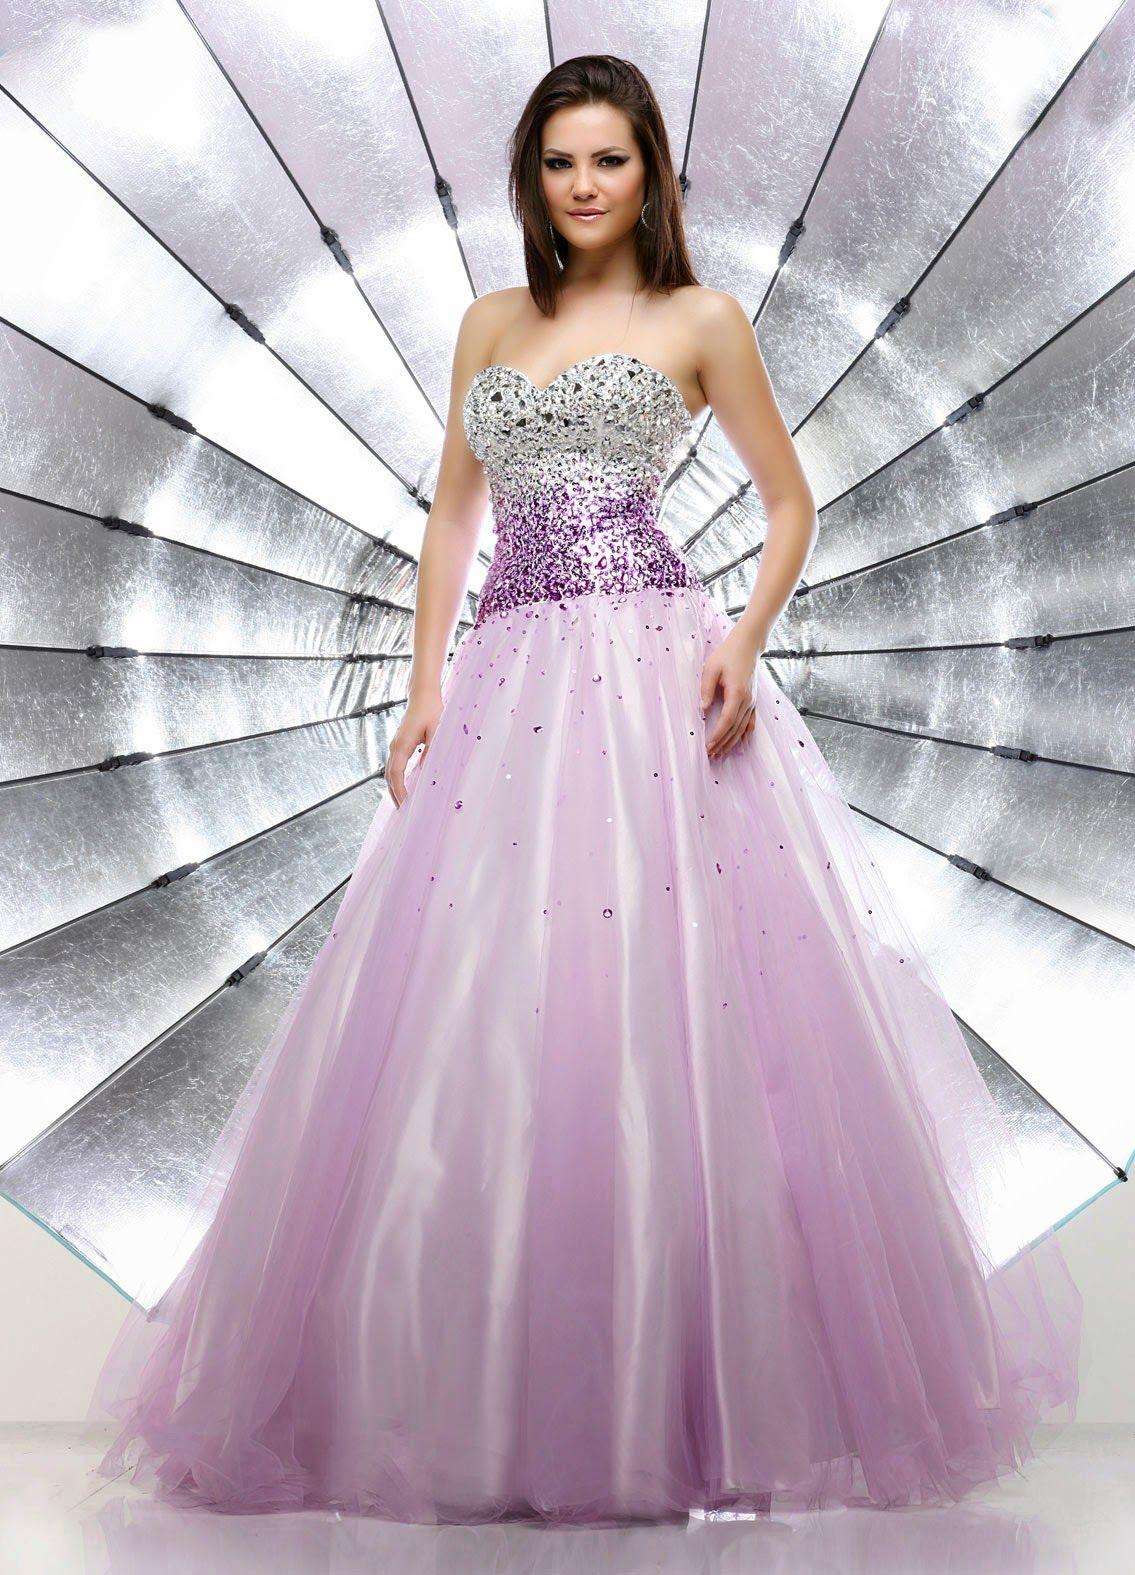 100 fiesta quinceanera dresses 55 quincea eras for 22 changes salon